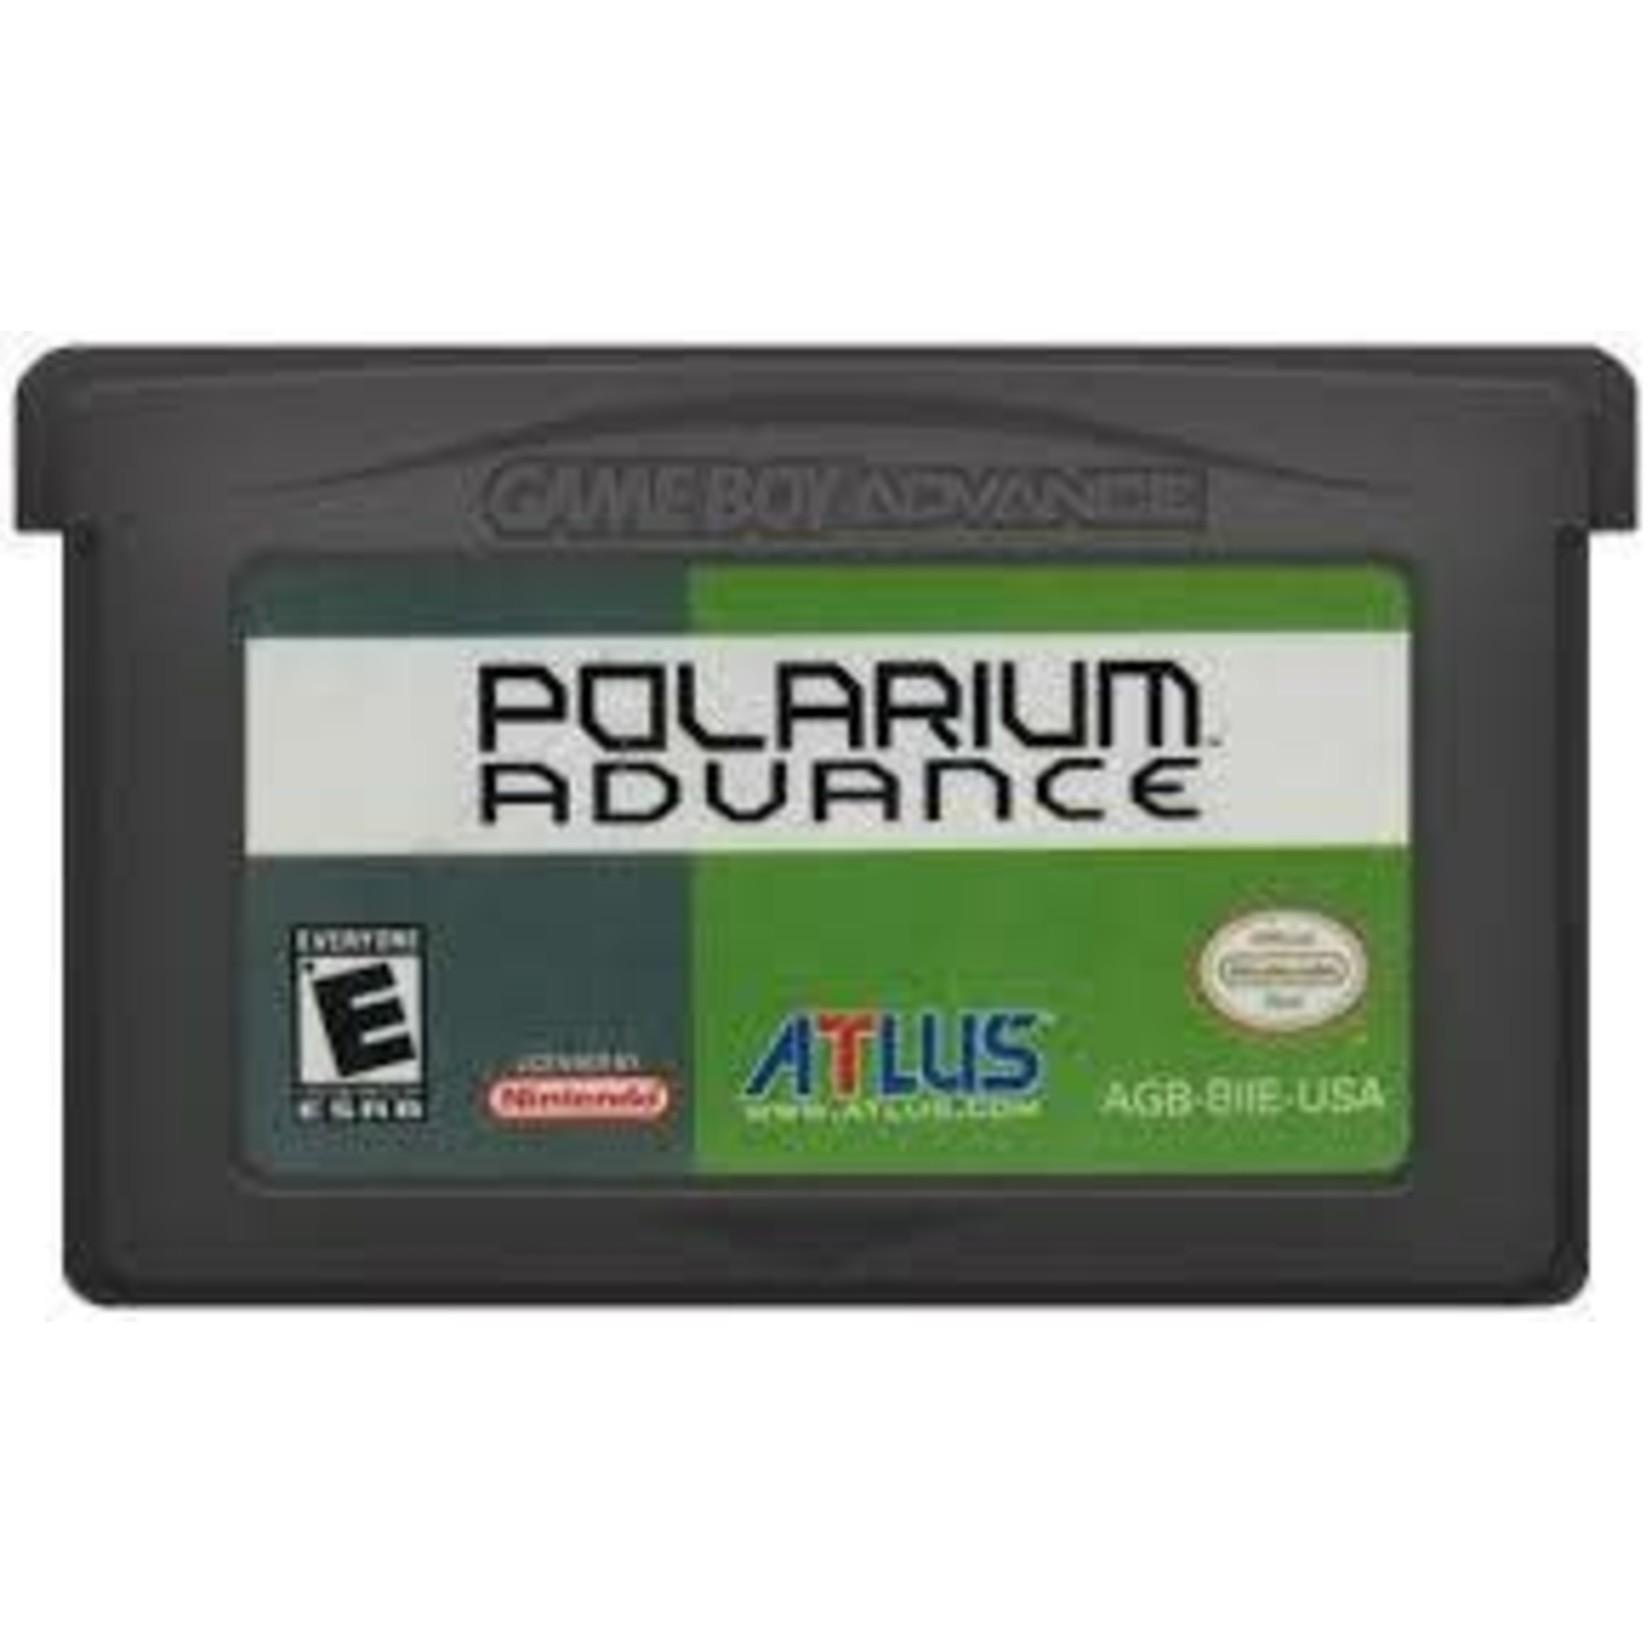 GBAU-Polarium Advance (CARTRIDGE)